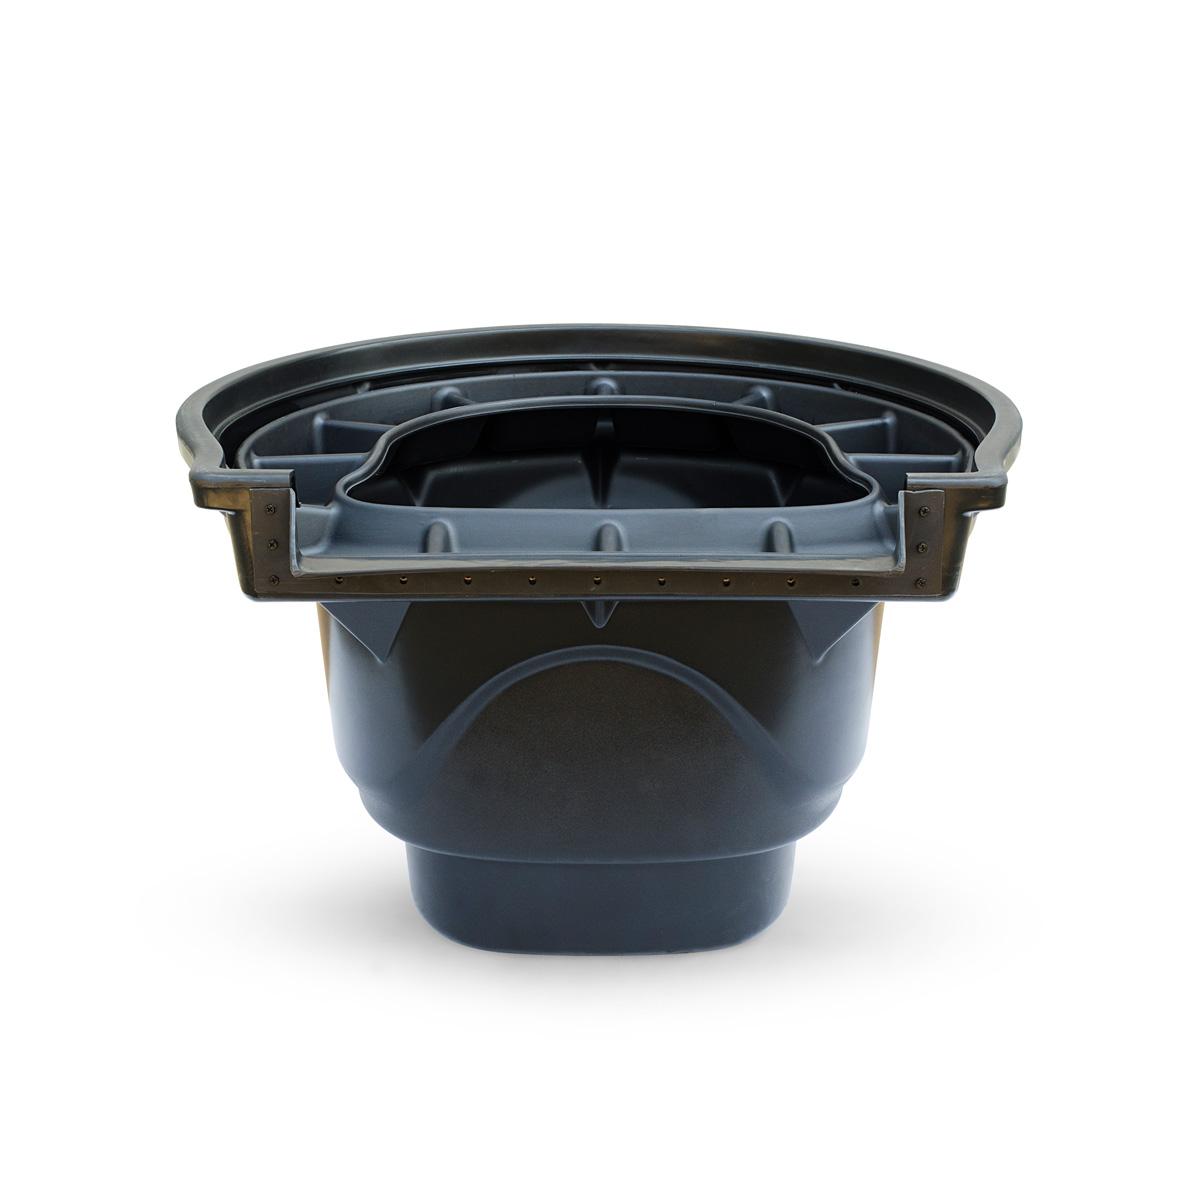 Aquascape signature series biofalls filter 6000 gallon for Pond filter accessories